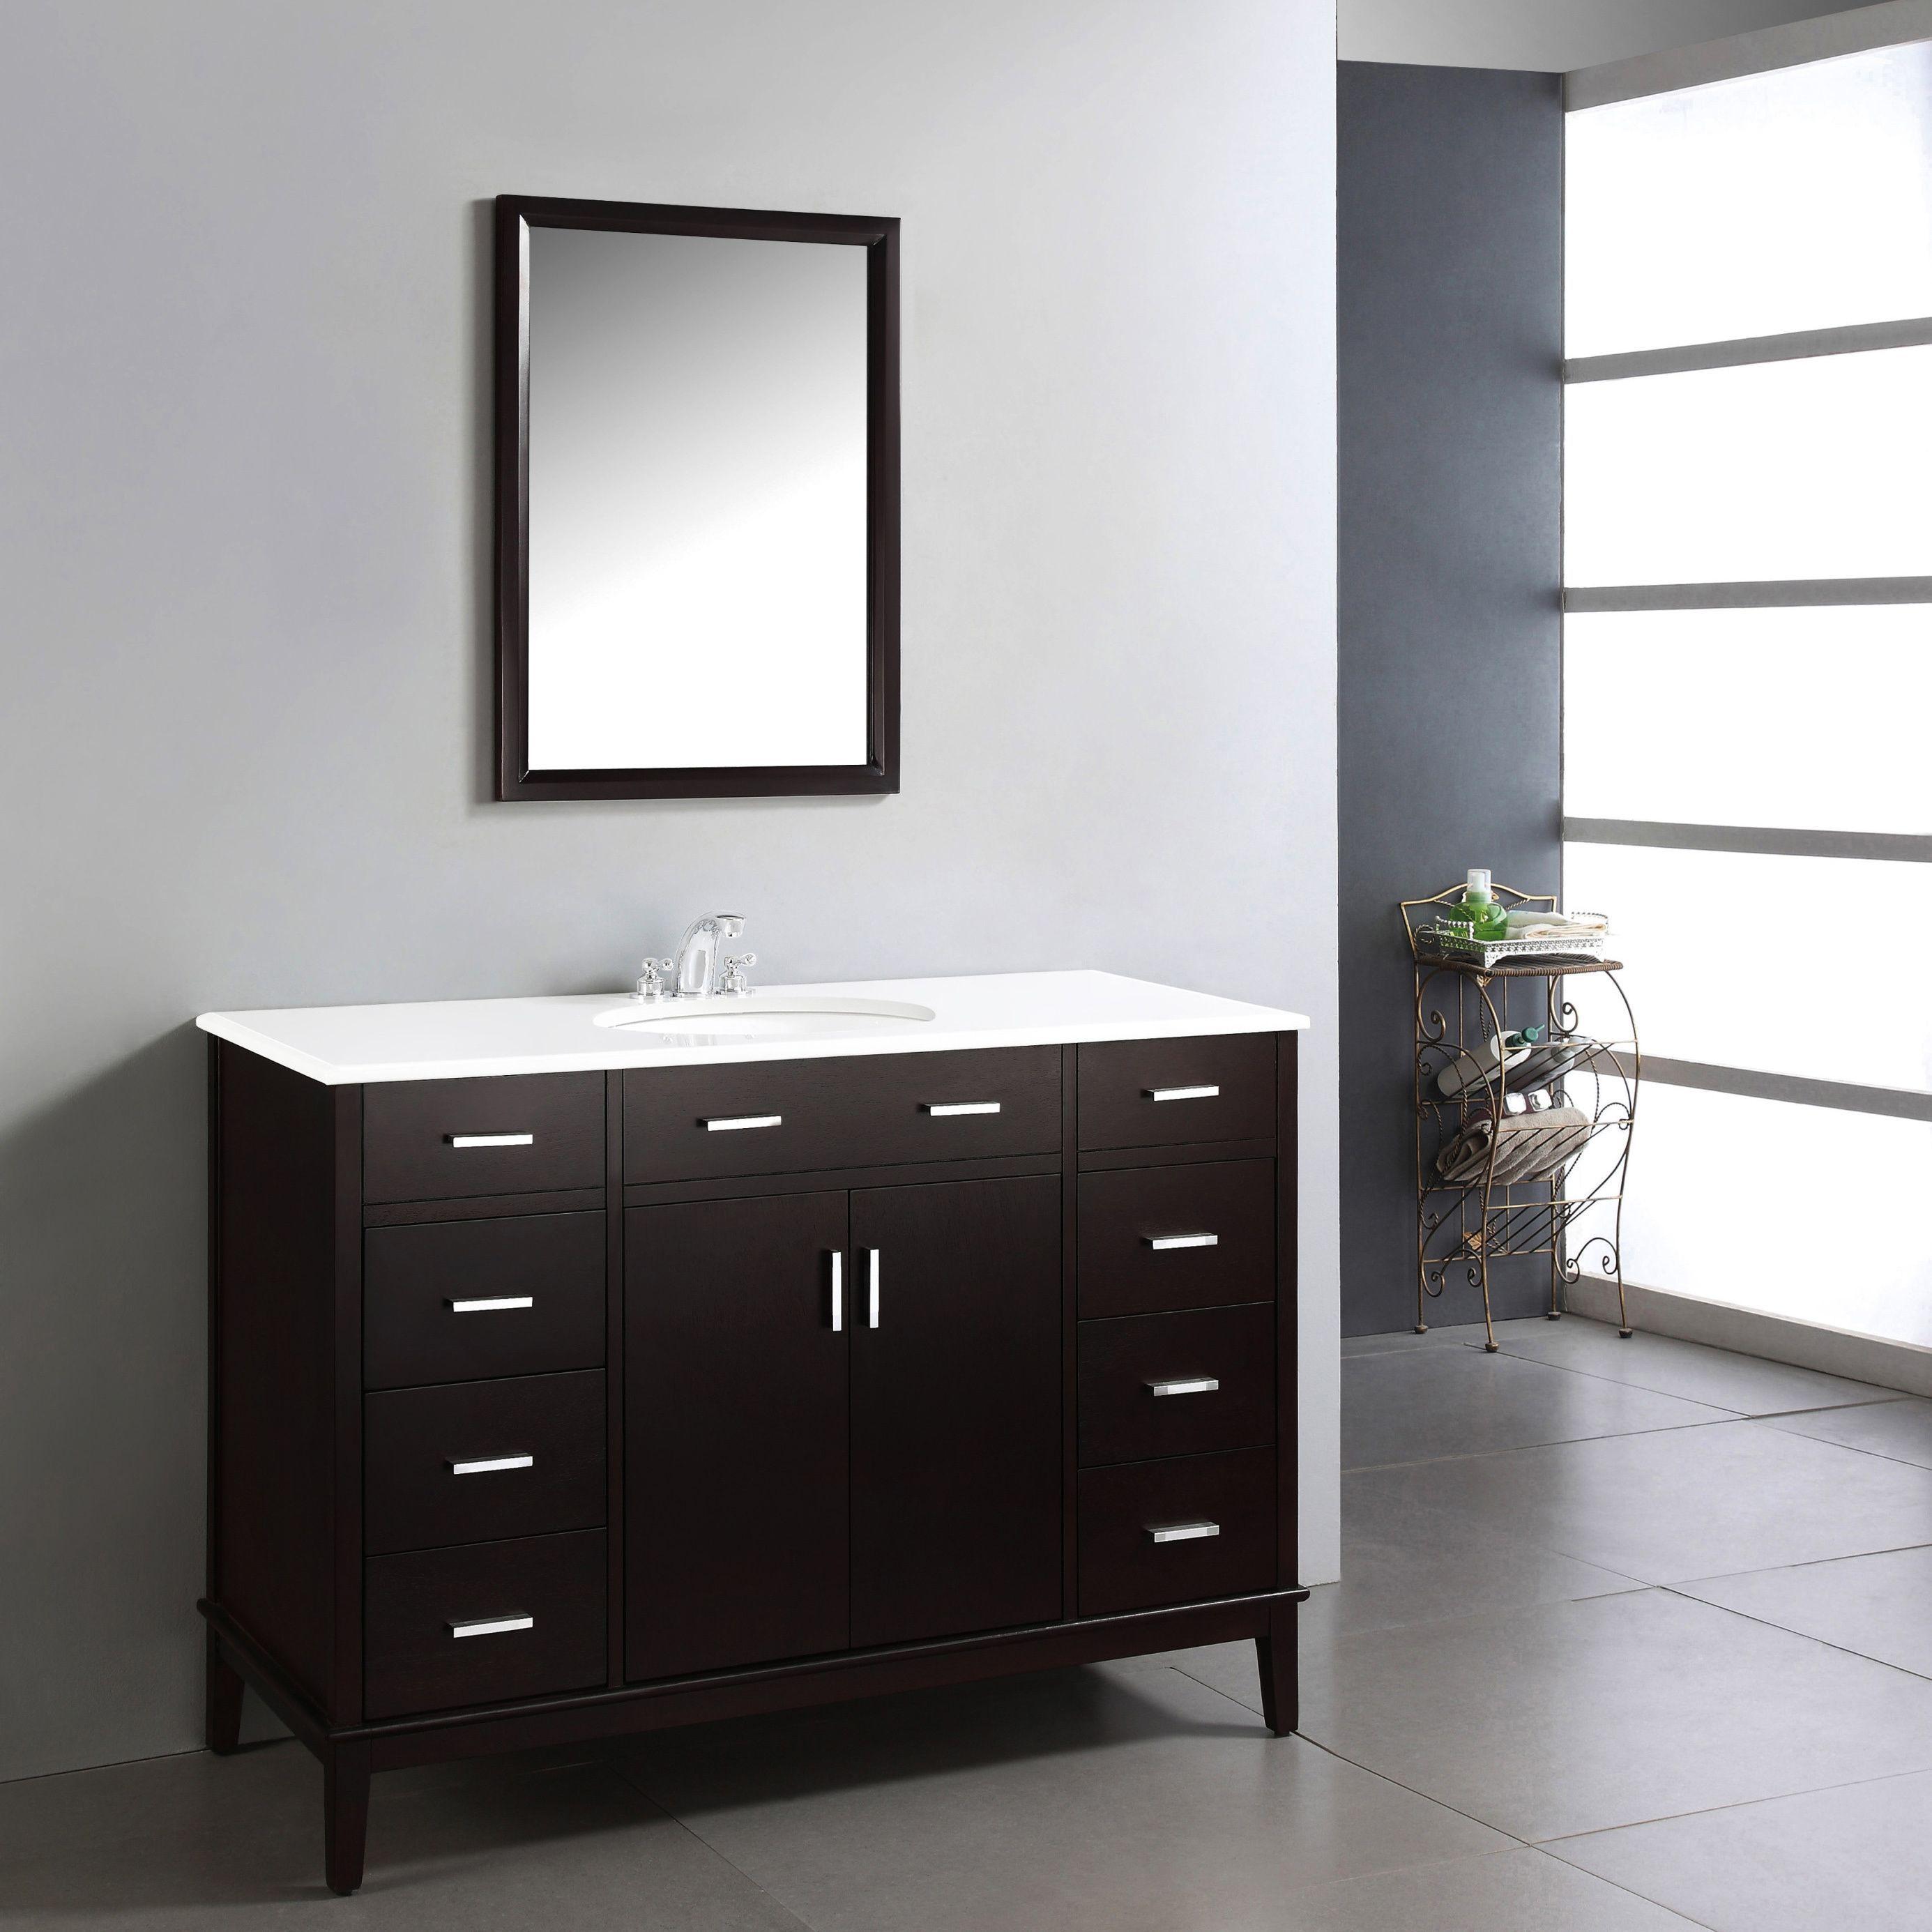 Wyndenhall Oxford 48 Inch Contemporary Bath Vanity In Dark Espresso Brown With White Engineered Quartz Marble Top Single Bathroom Vanity Marble Vanity Tops Vanity